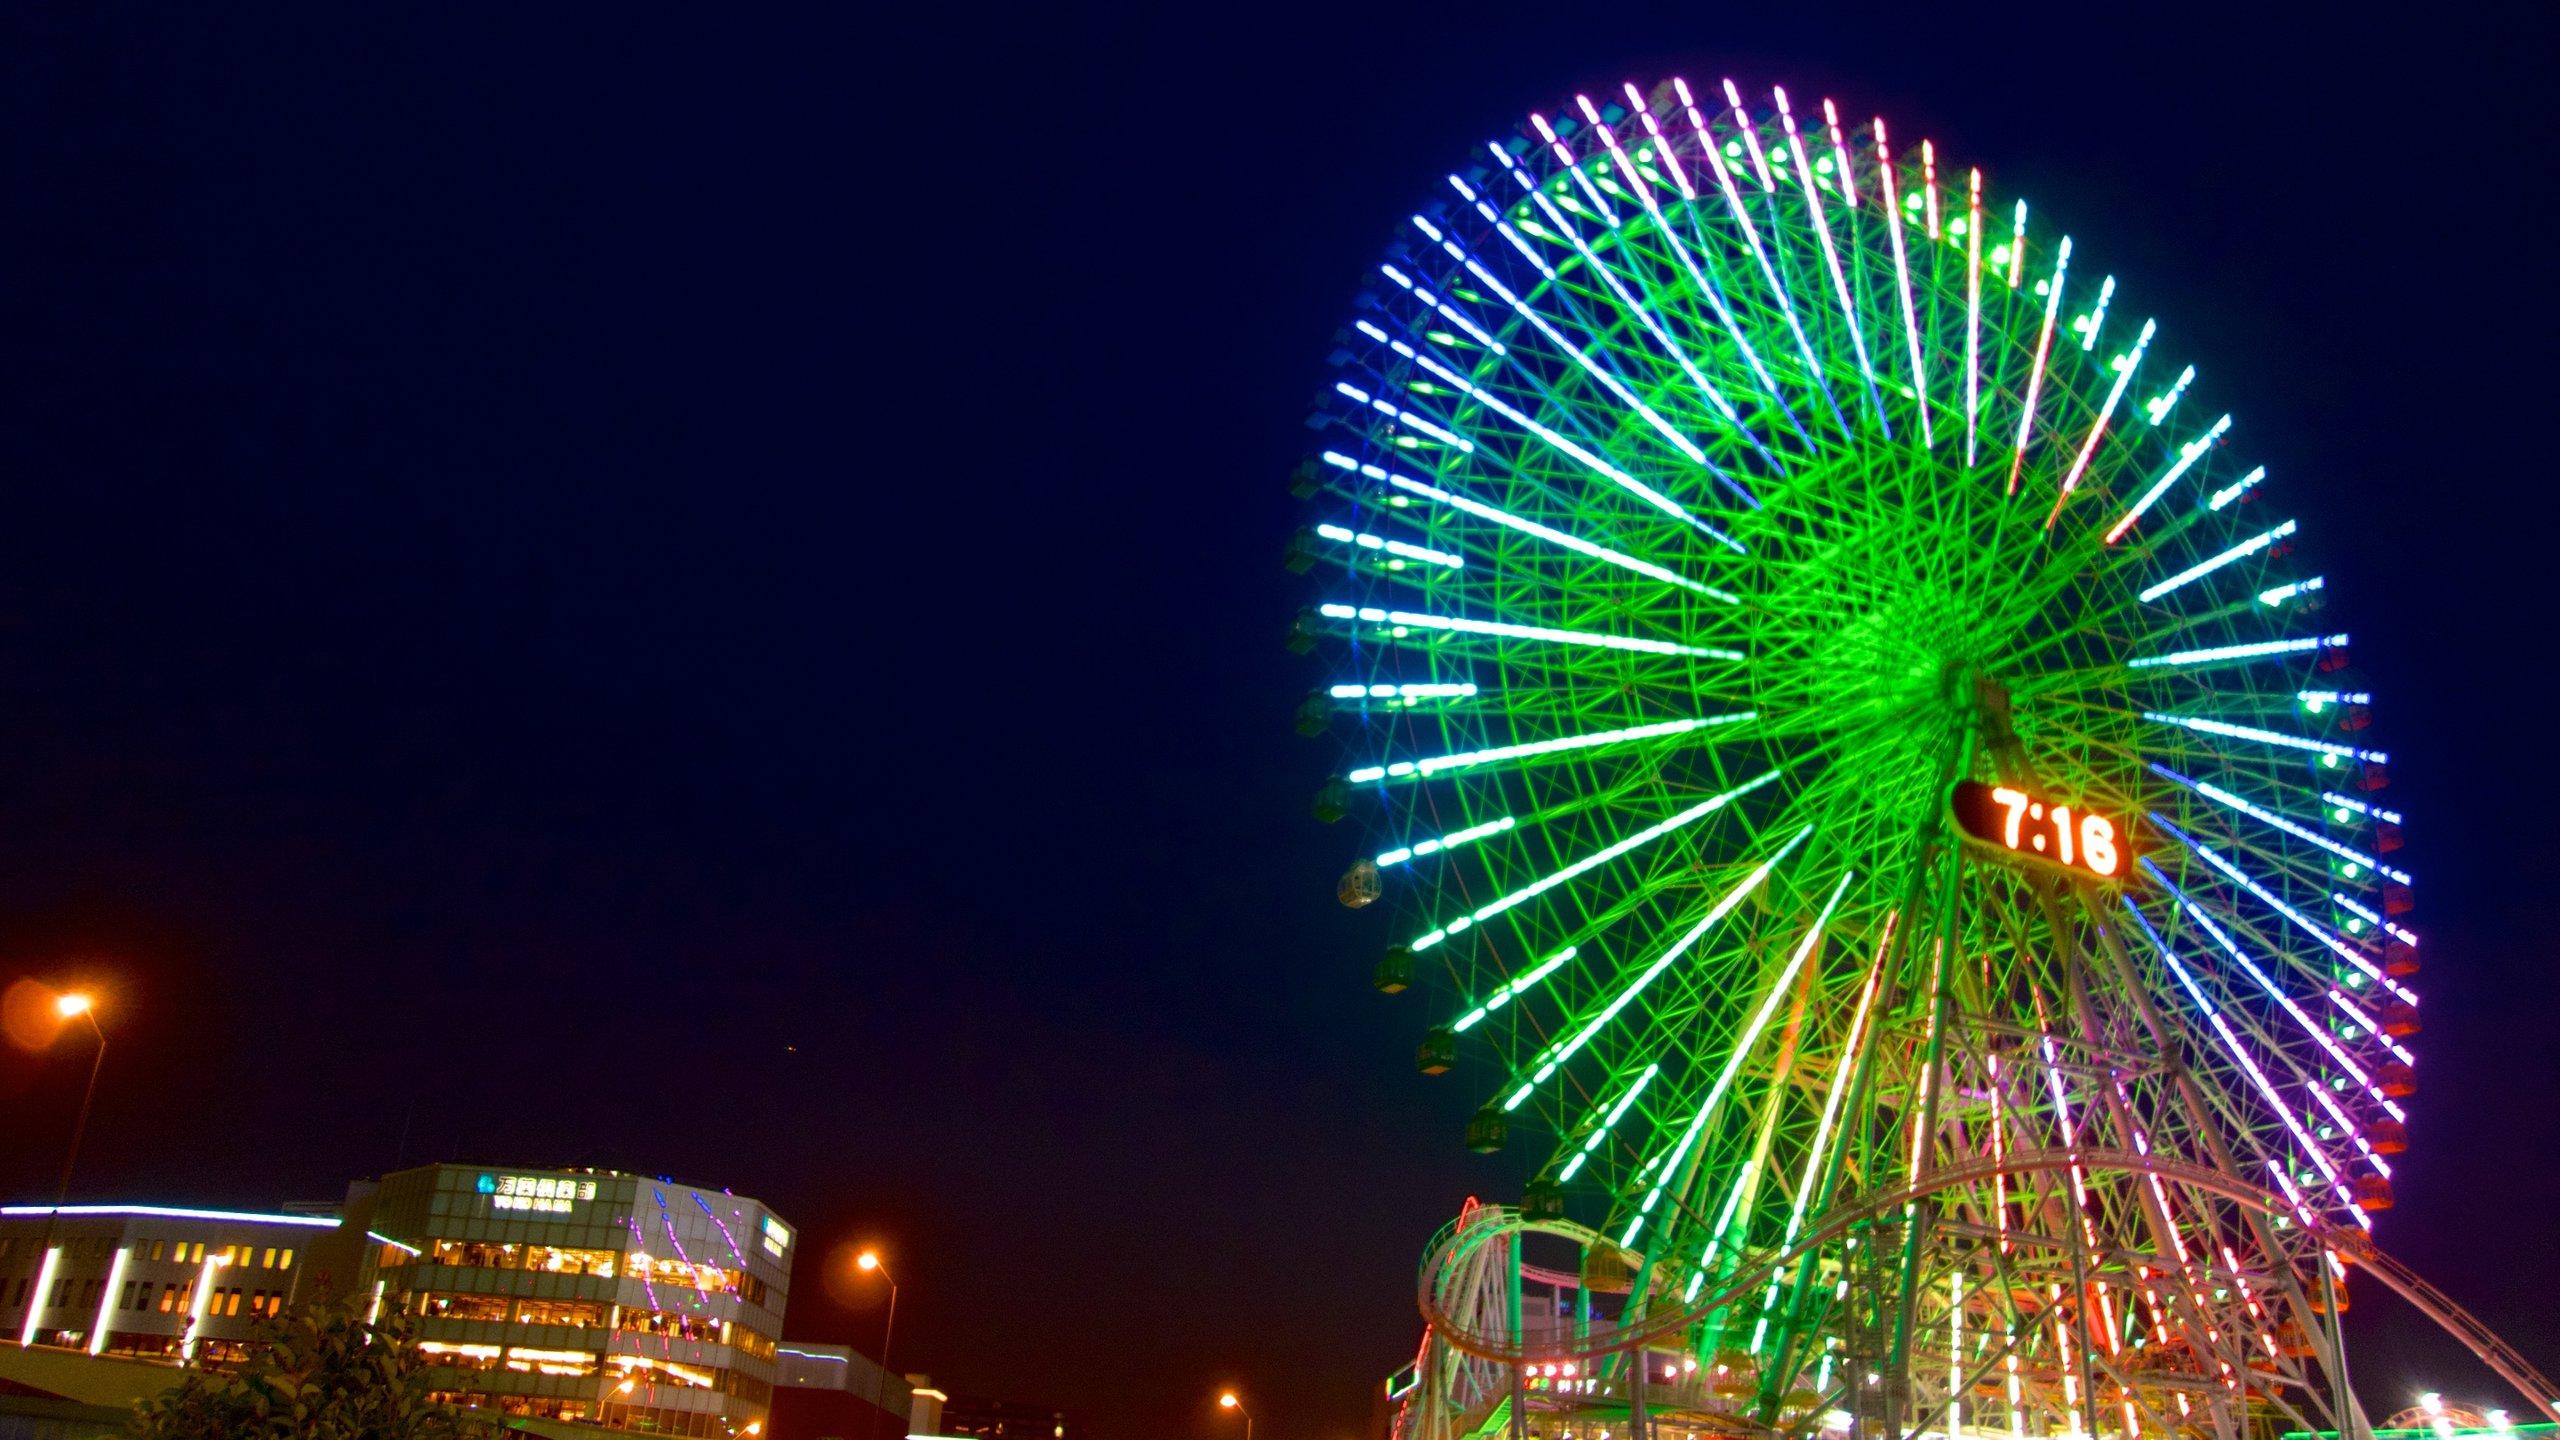 Chiba (Präfektur), Japan